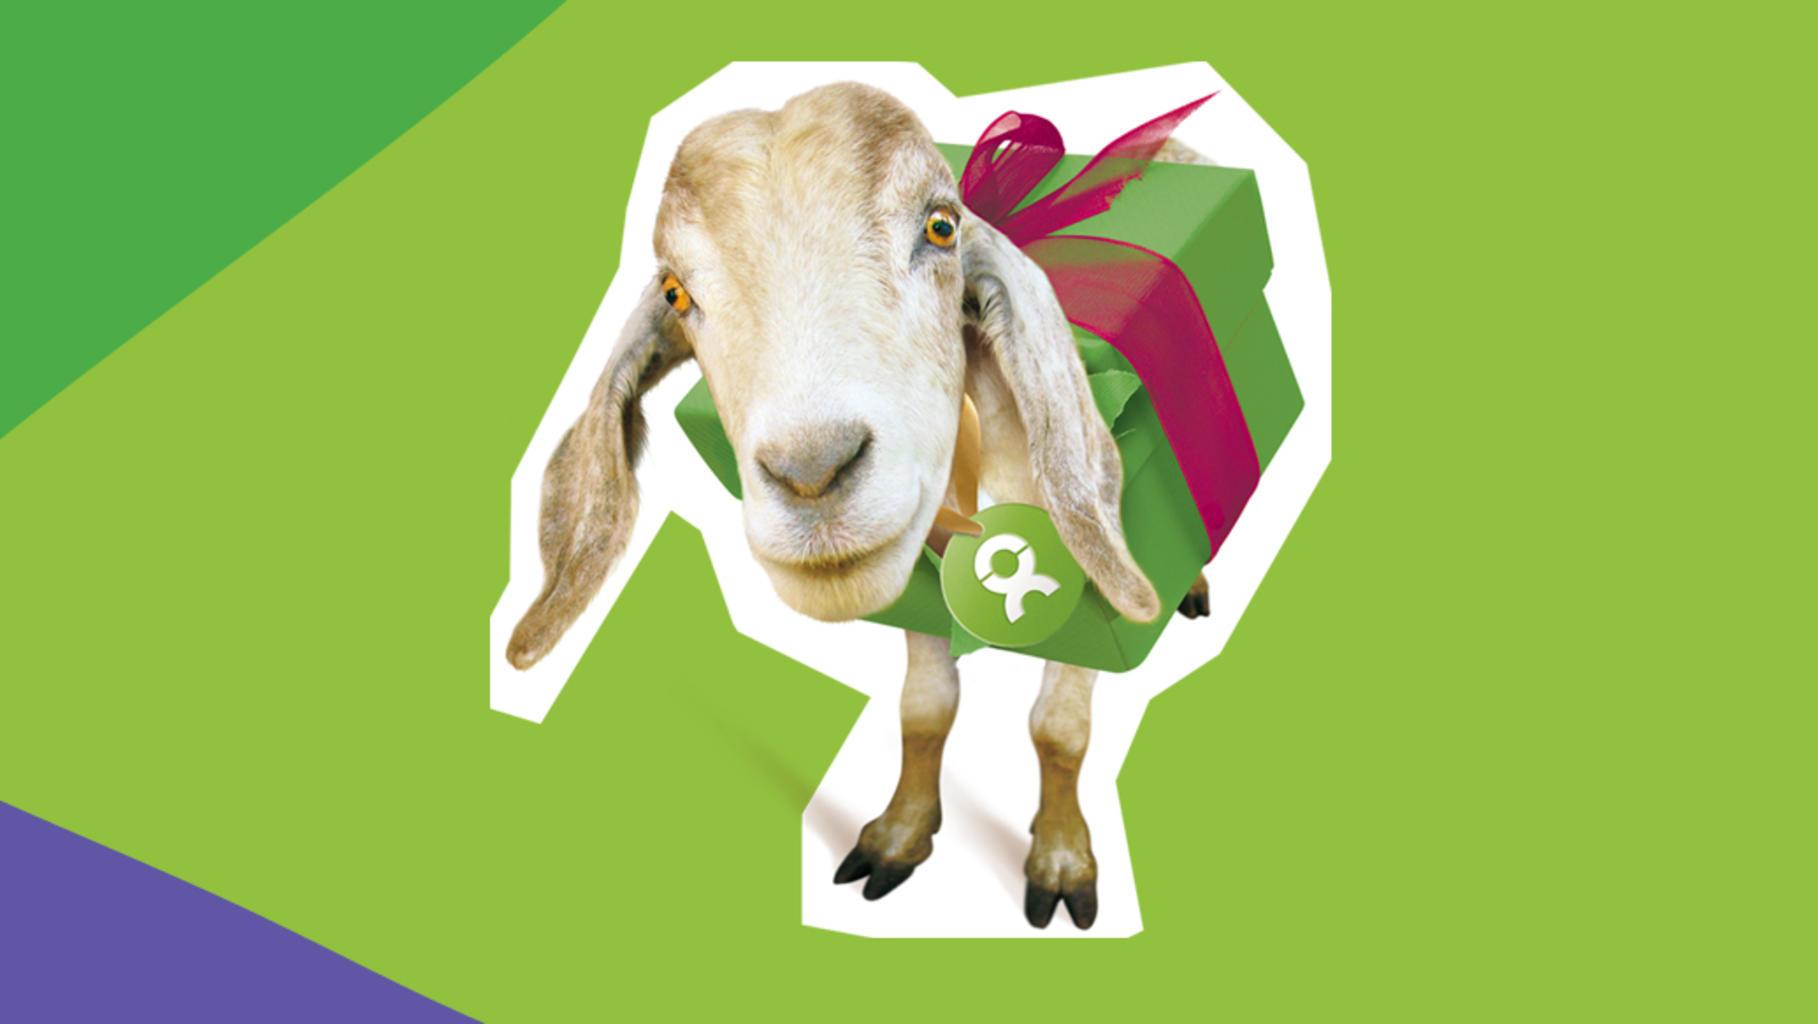 OxfamUnverpackt Ziege